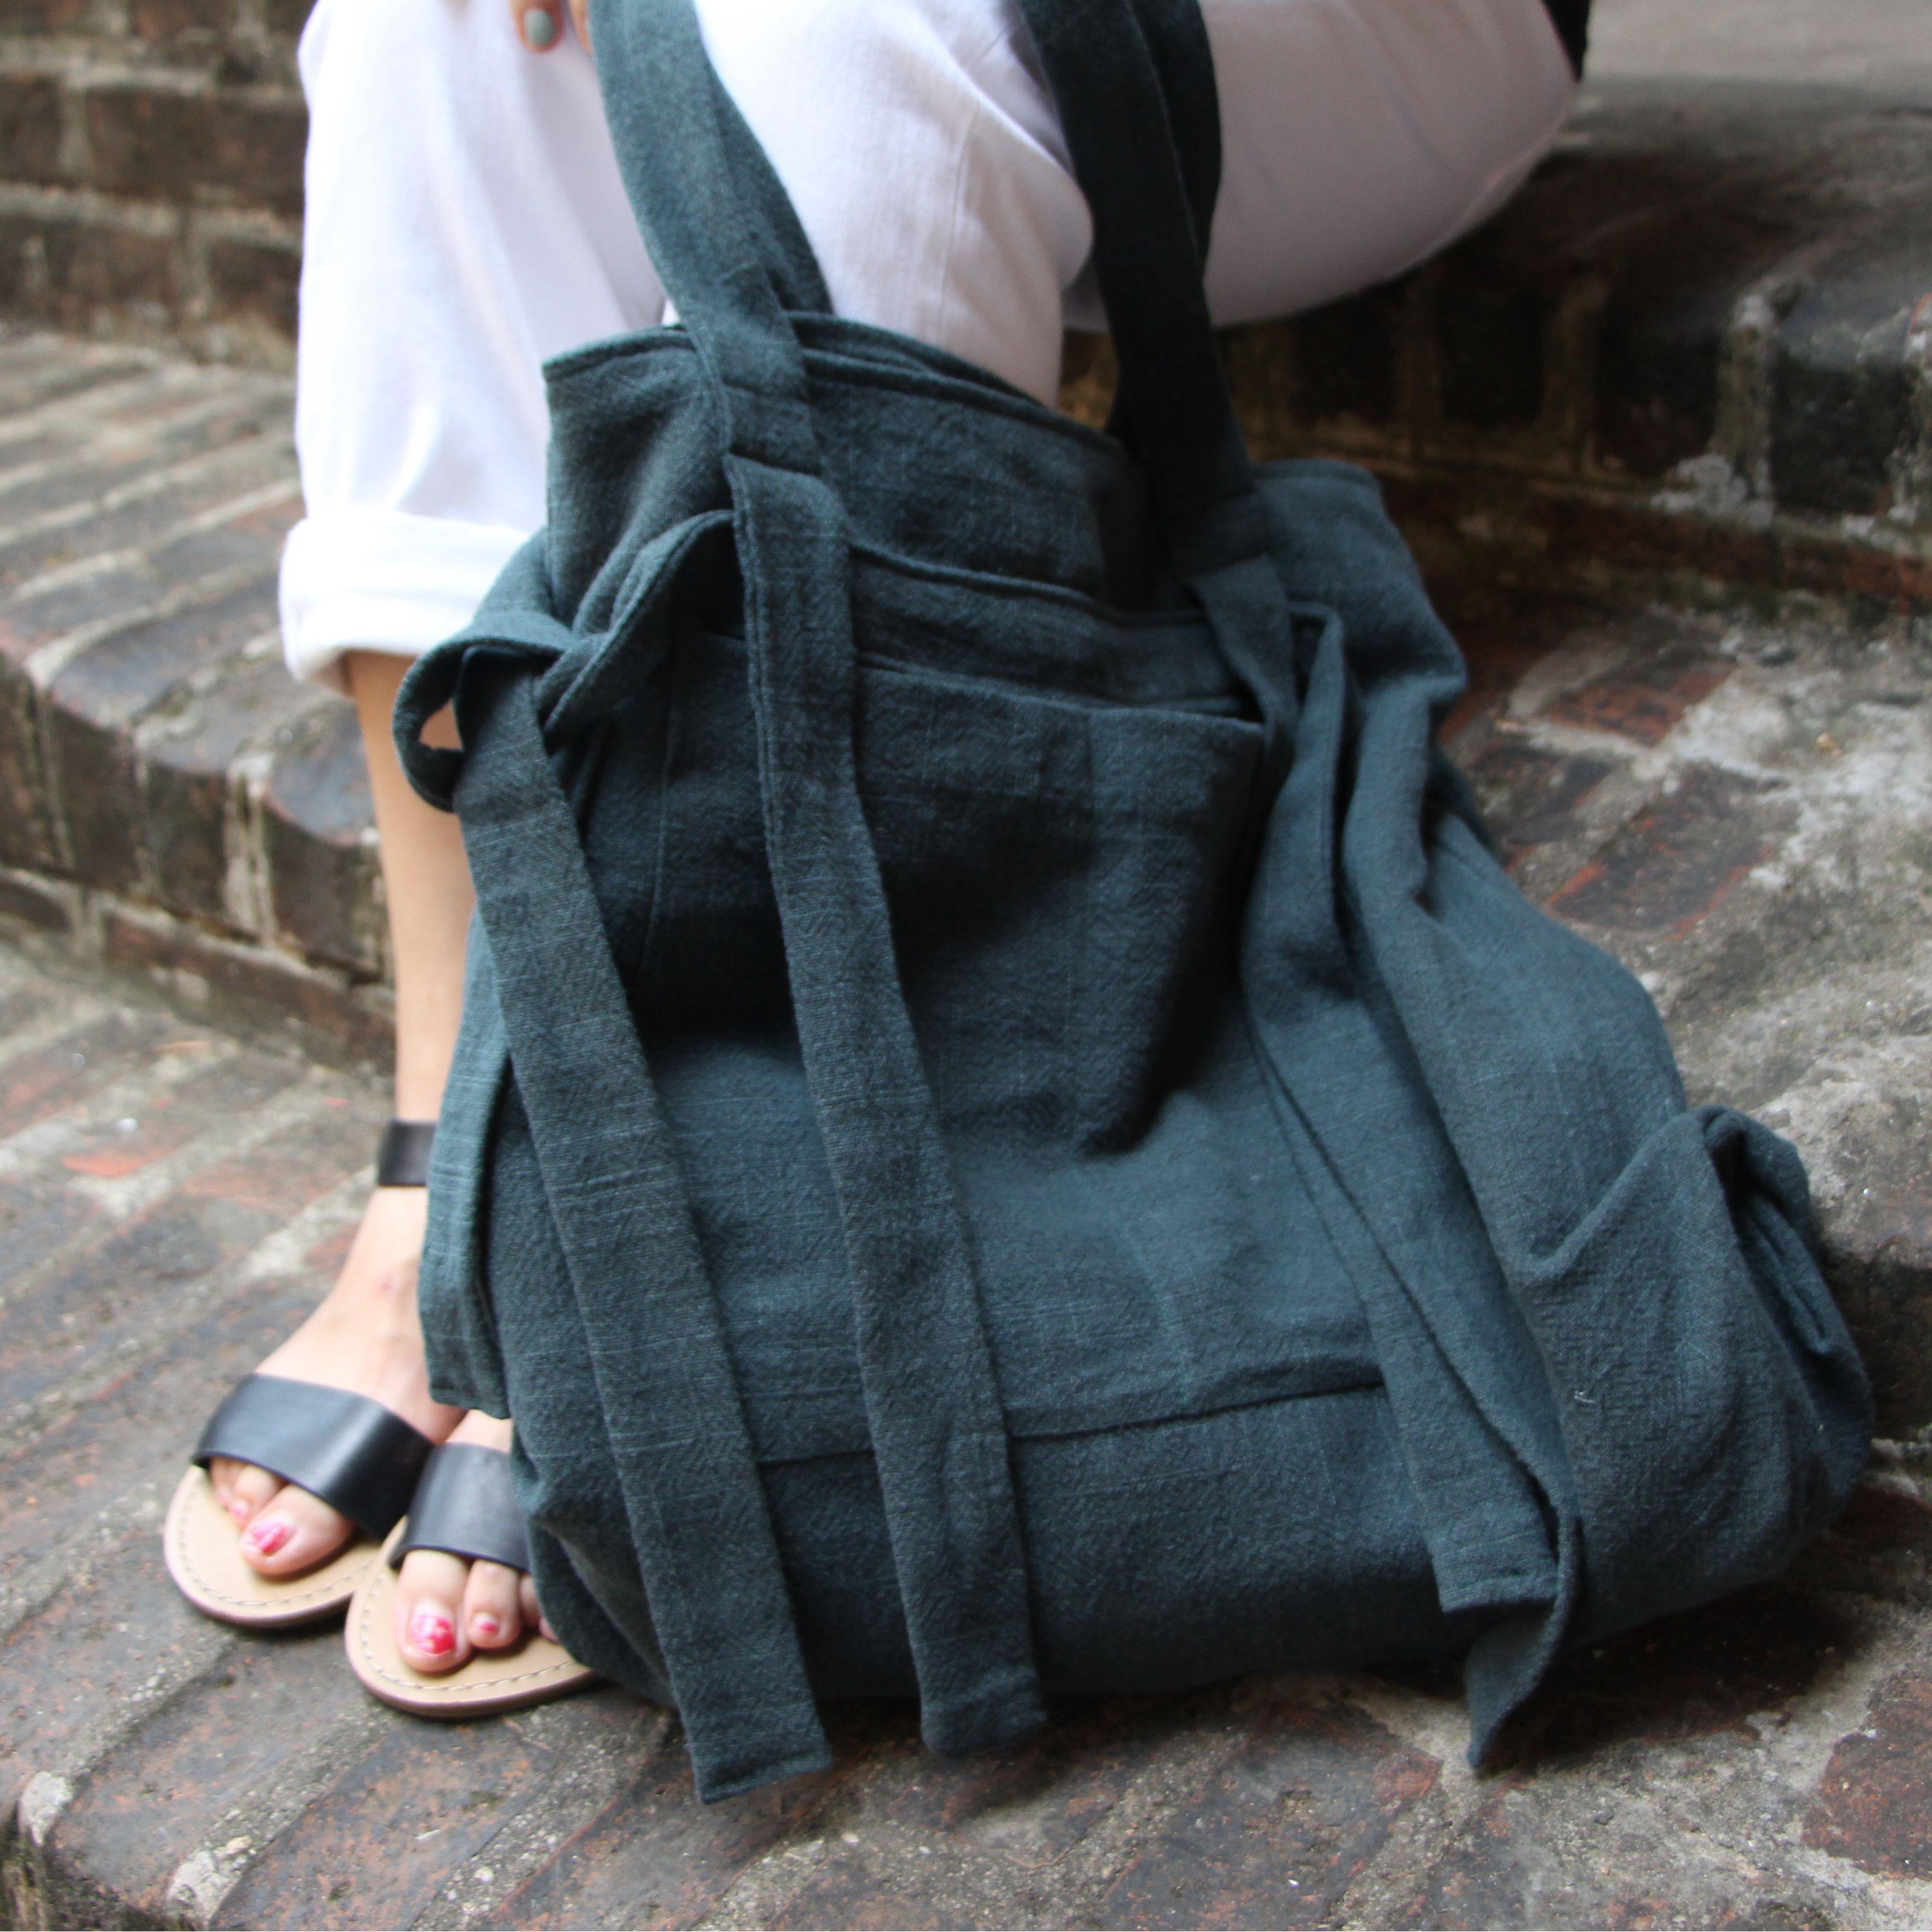 Borse Casual : Women s handmade shoulder handbags casual big cotton